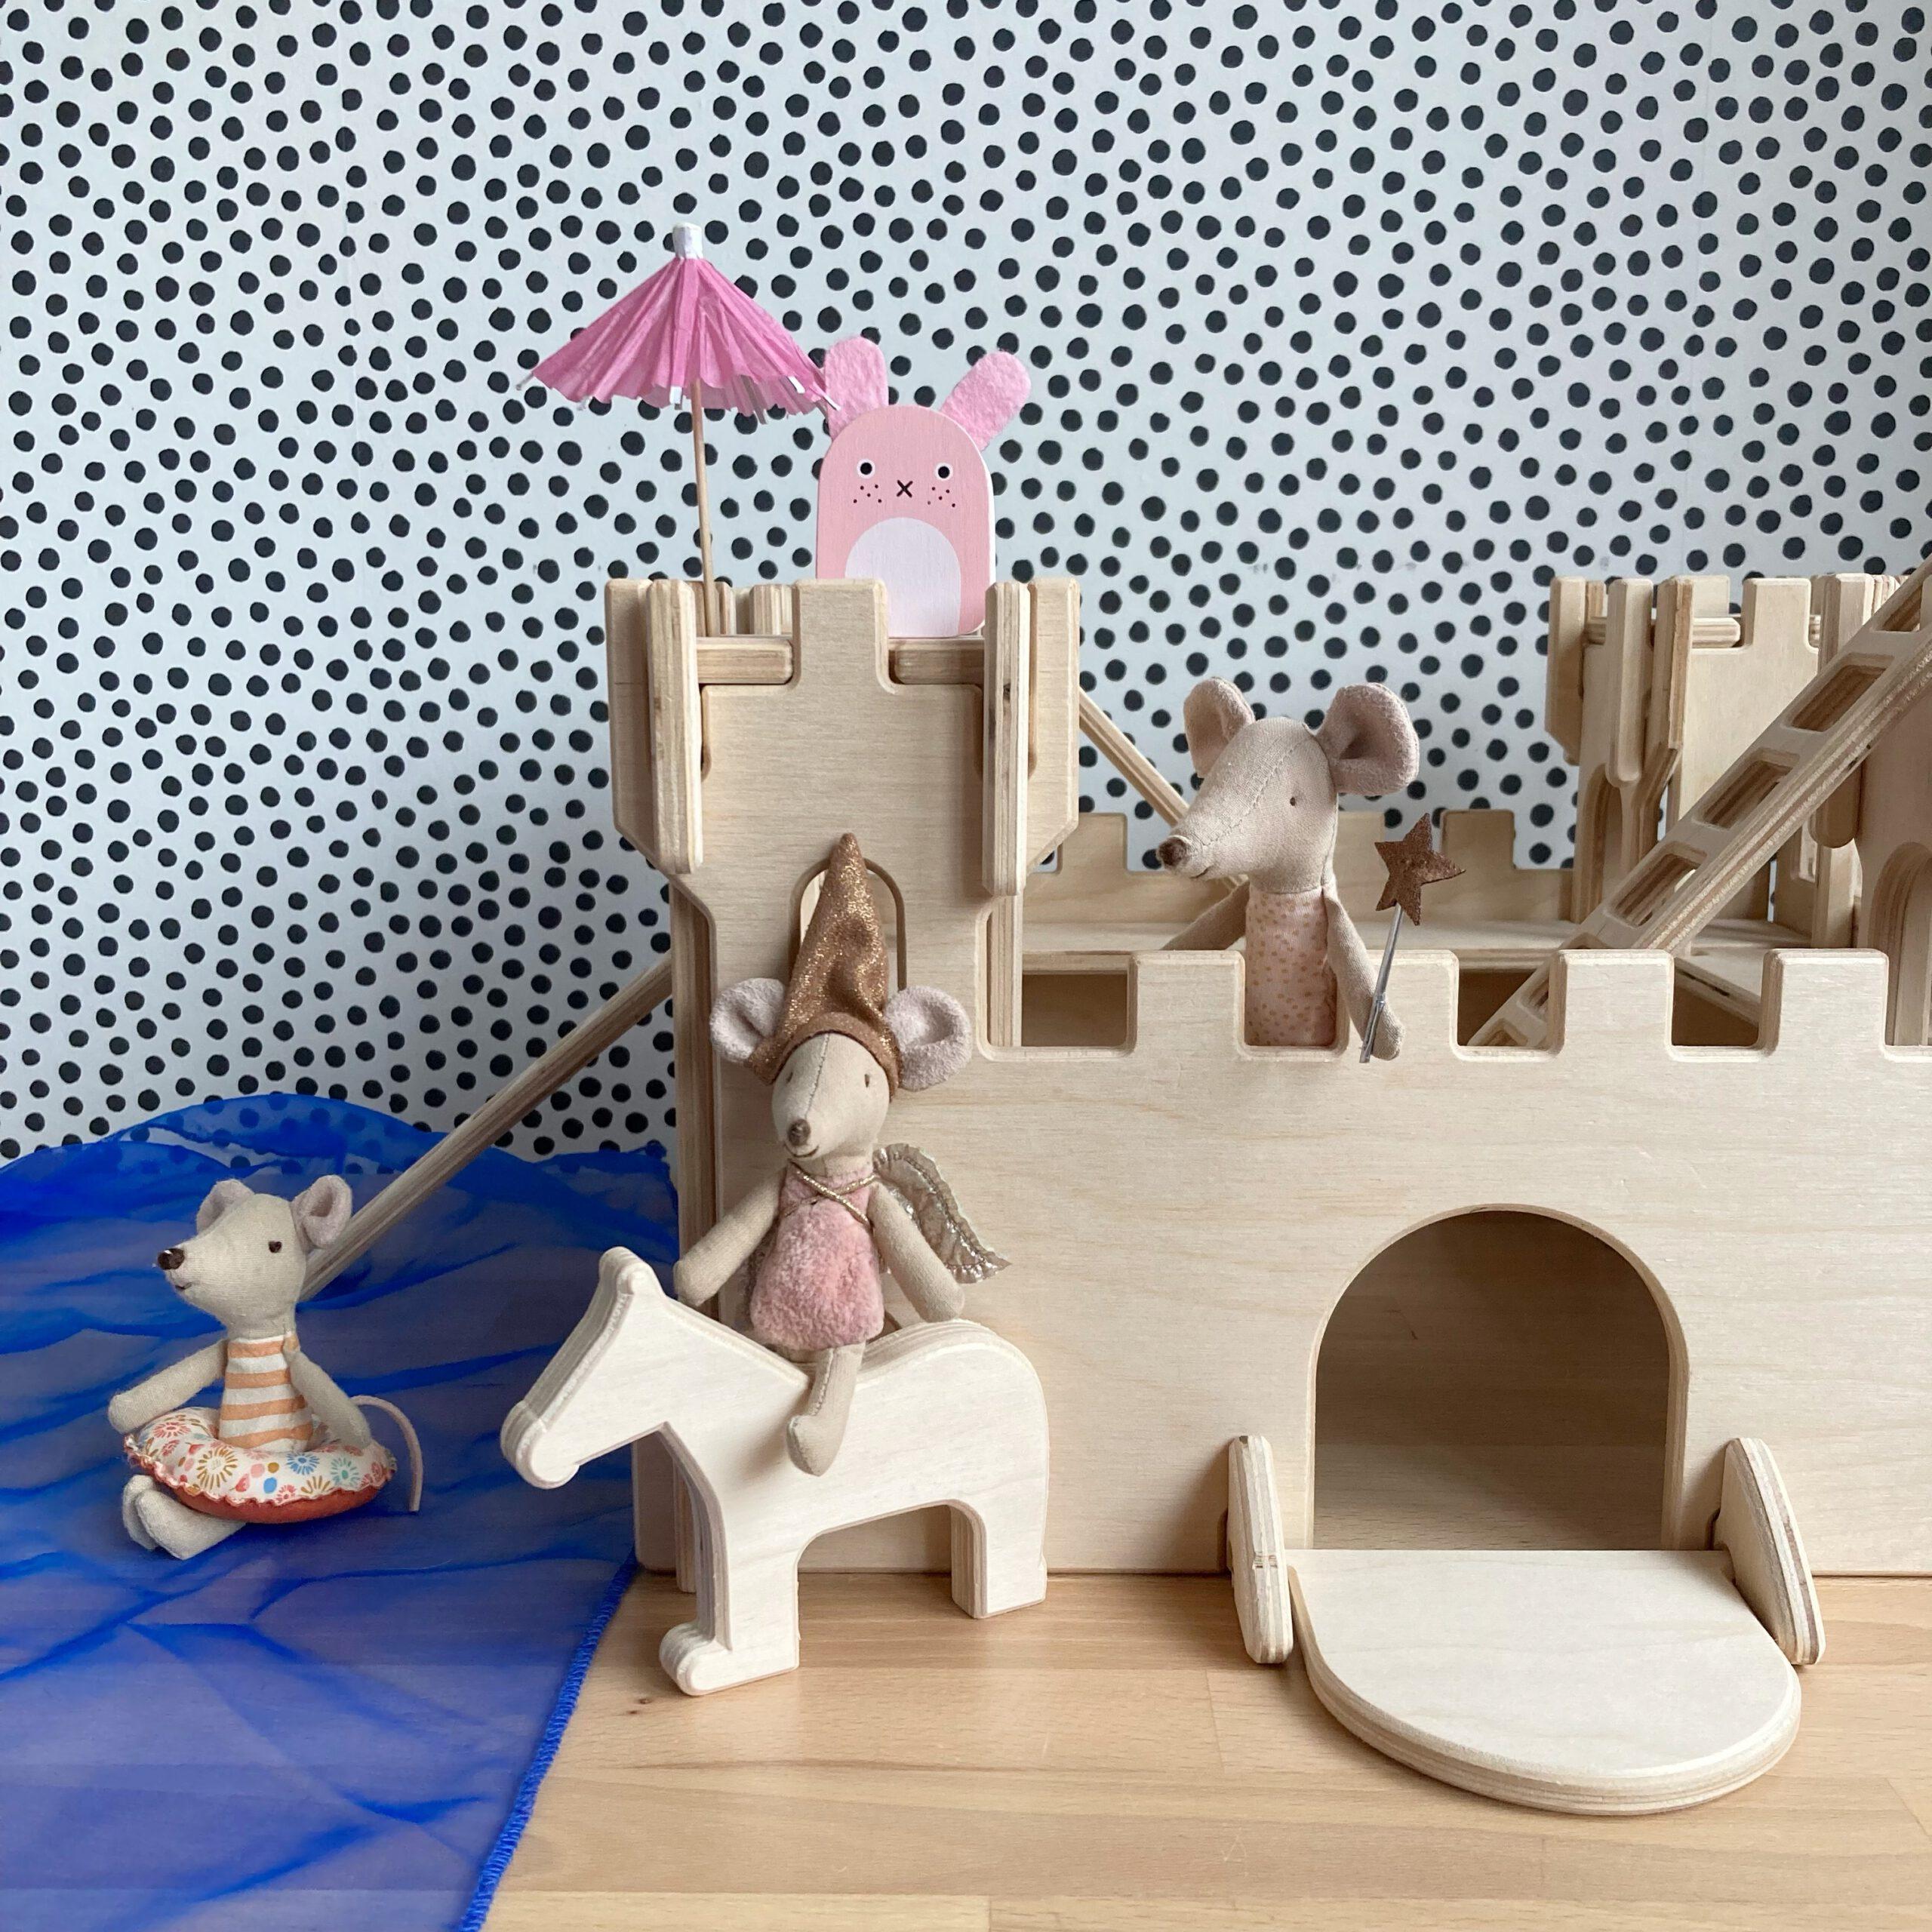 duurzaam houten speelgoed lovelties